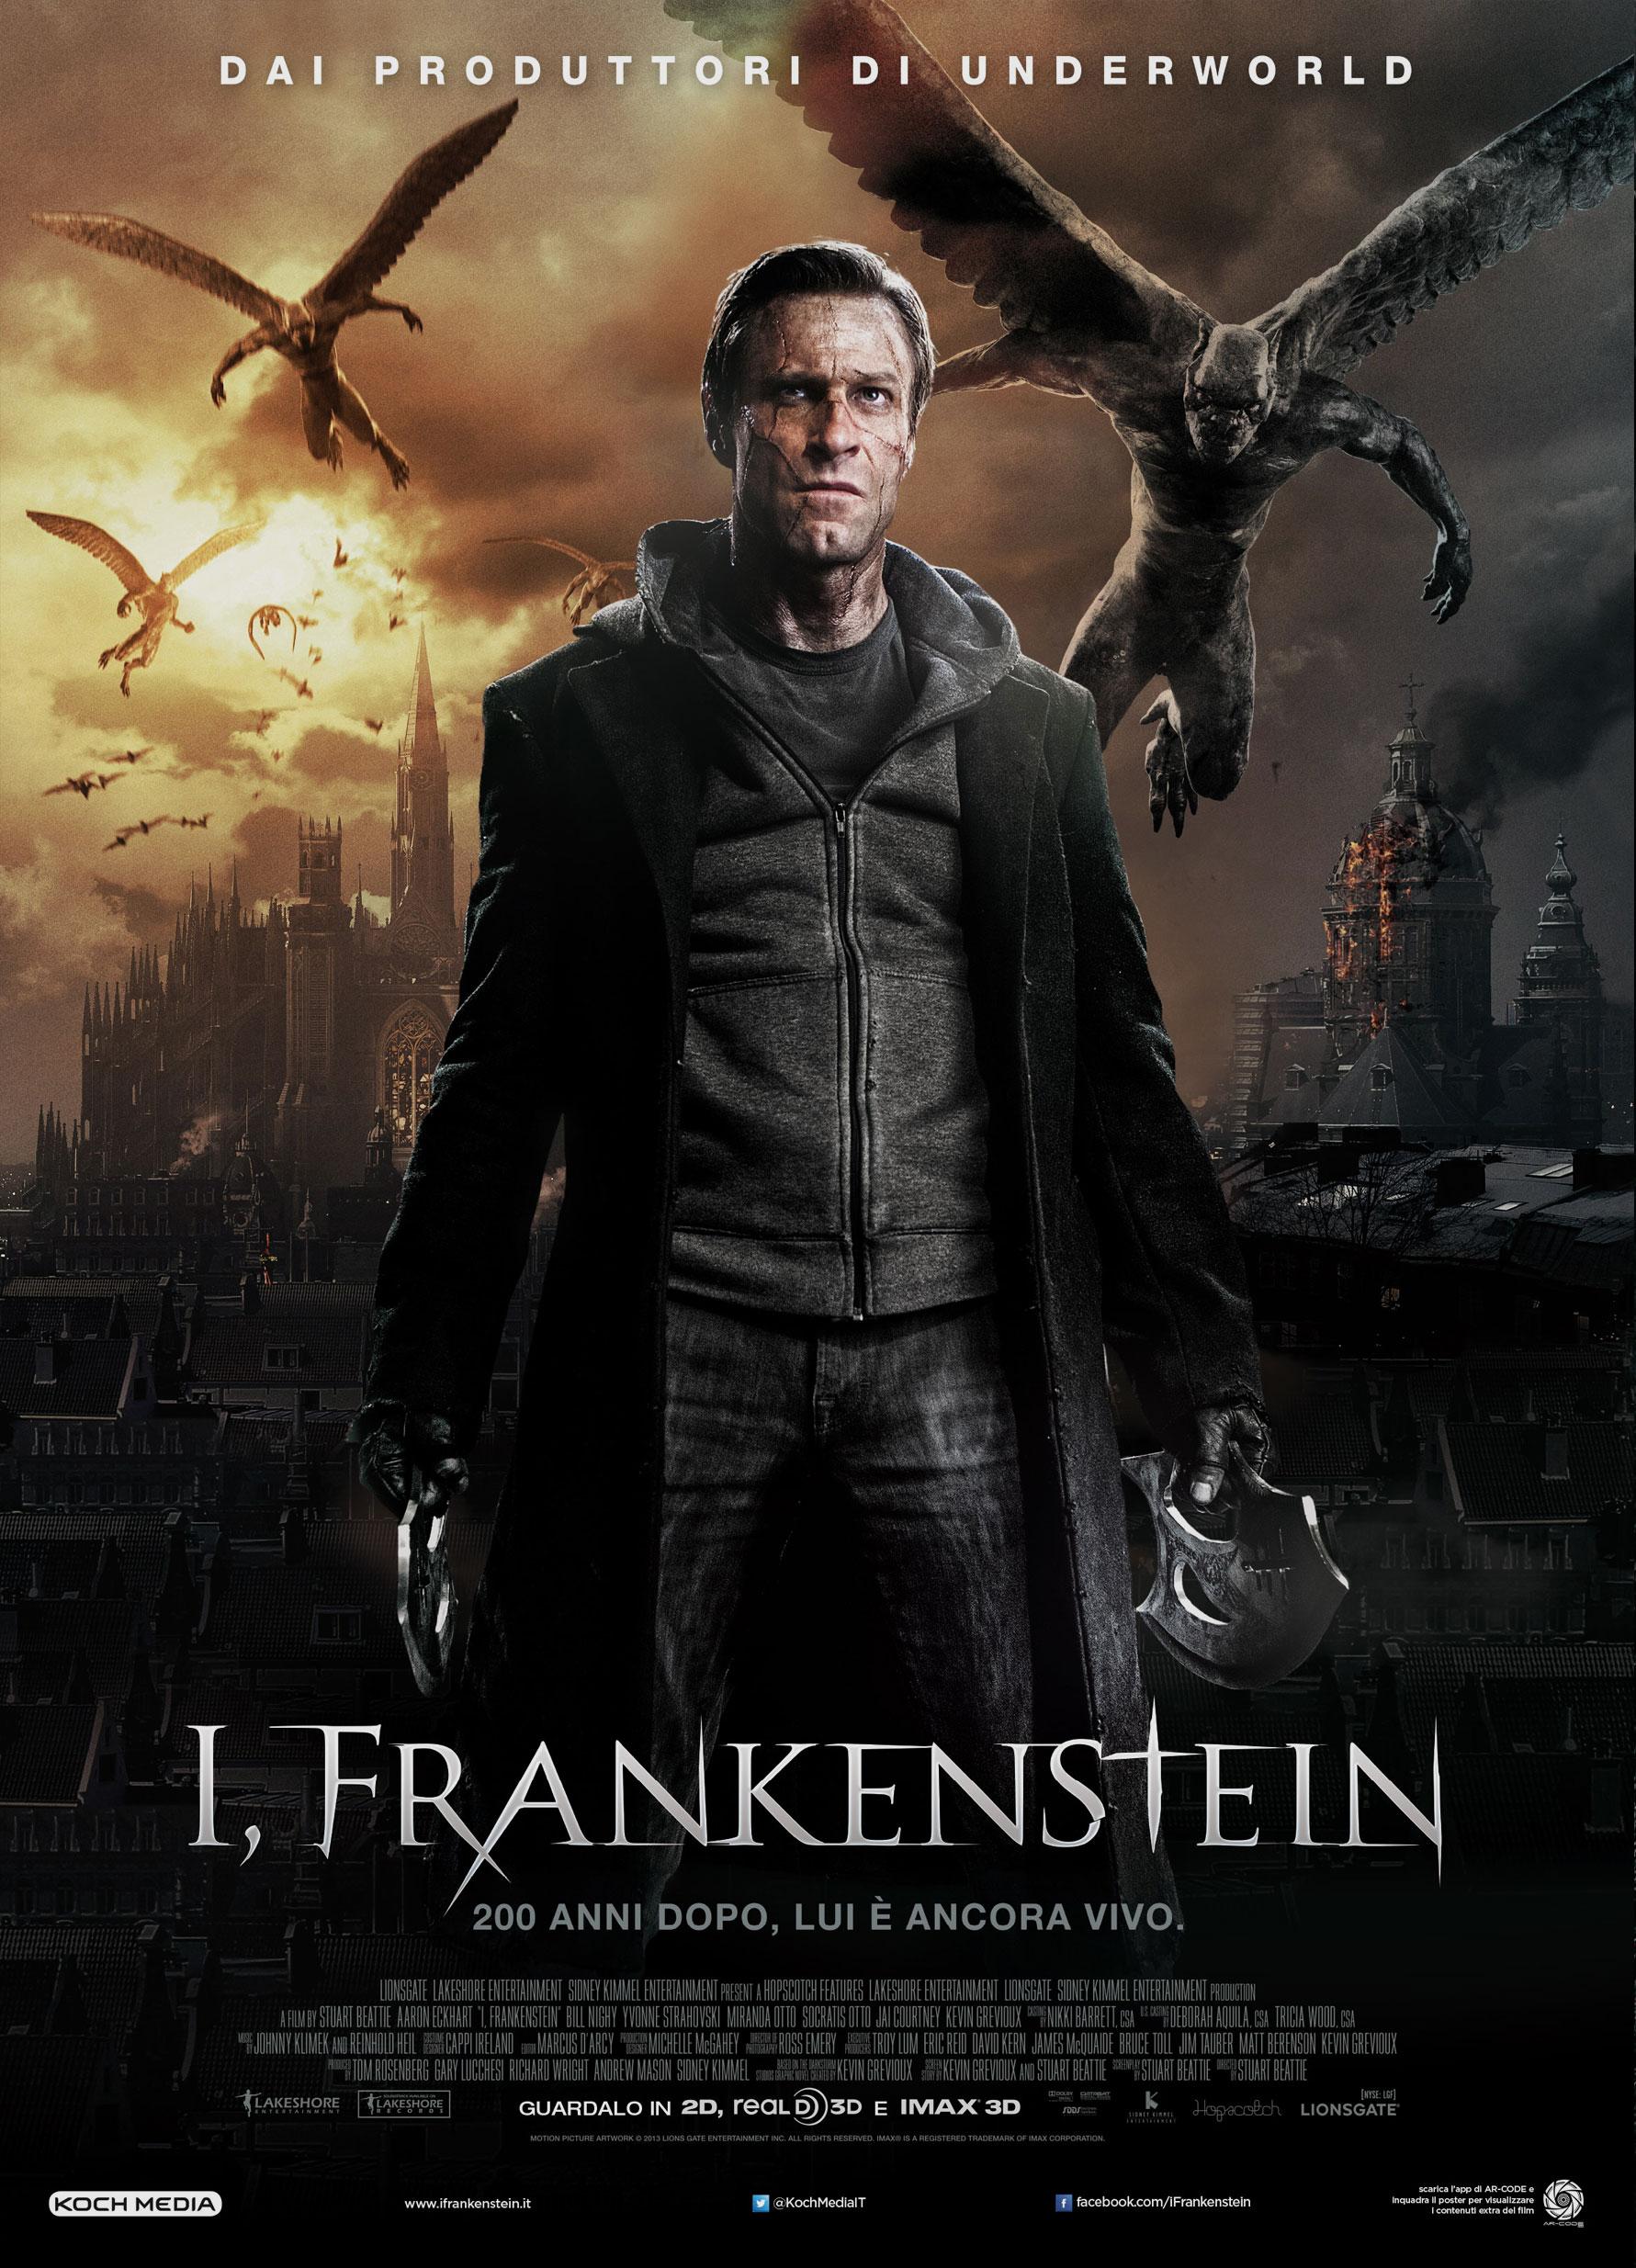 Vertigo Movie AdvertisingI, Frankenstein - Vertigo Movie ...